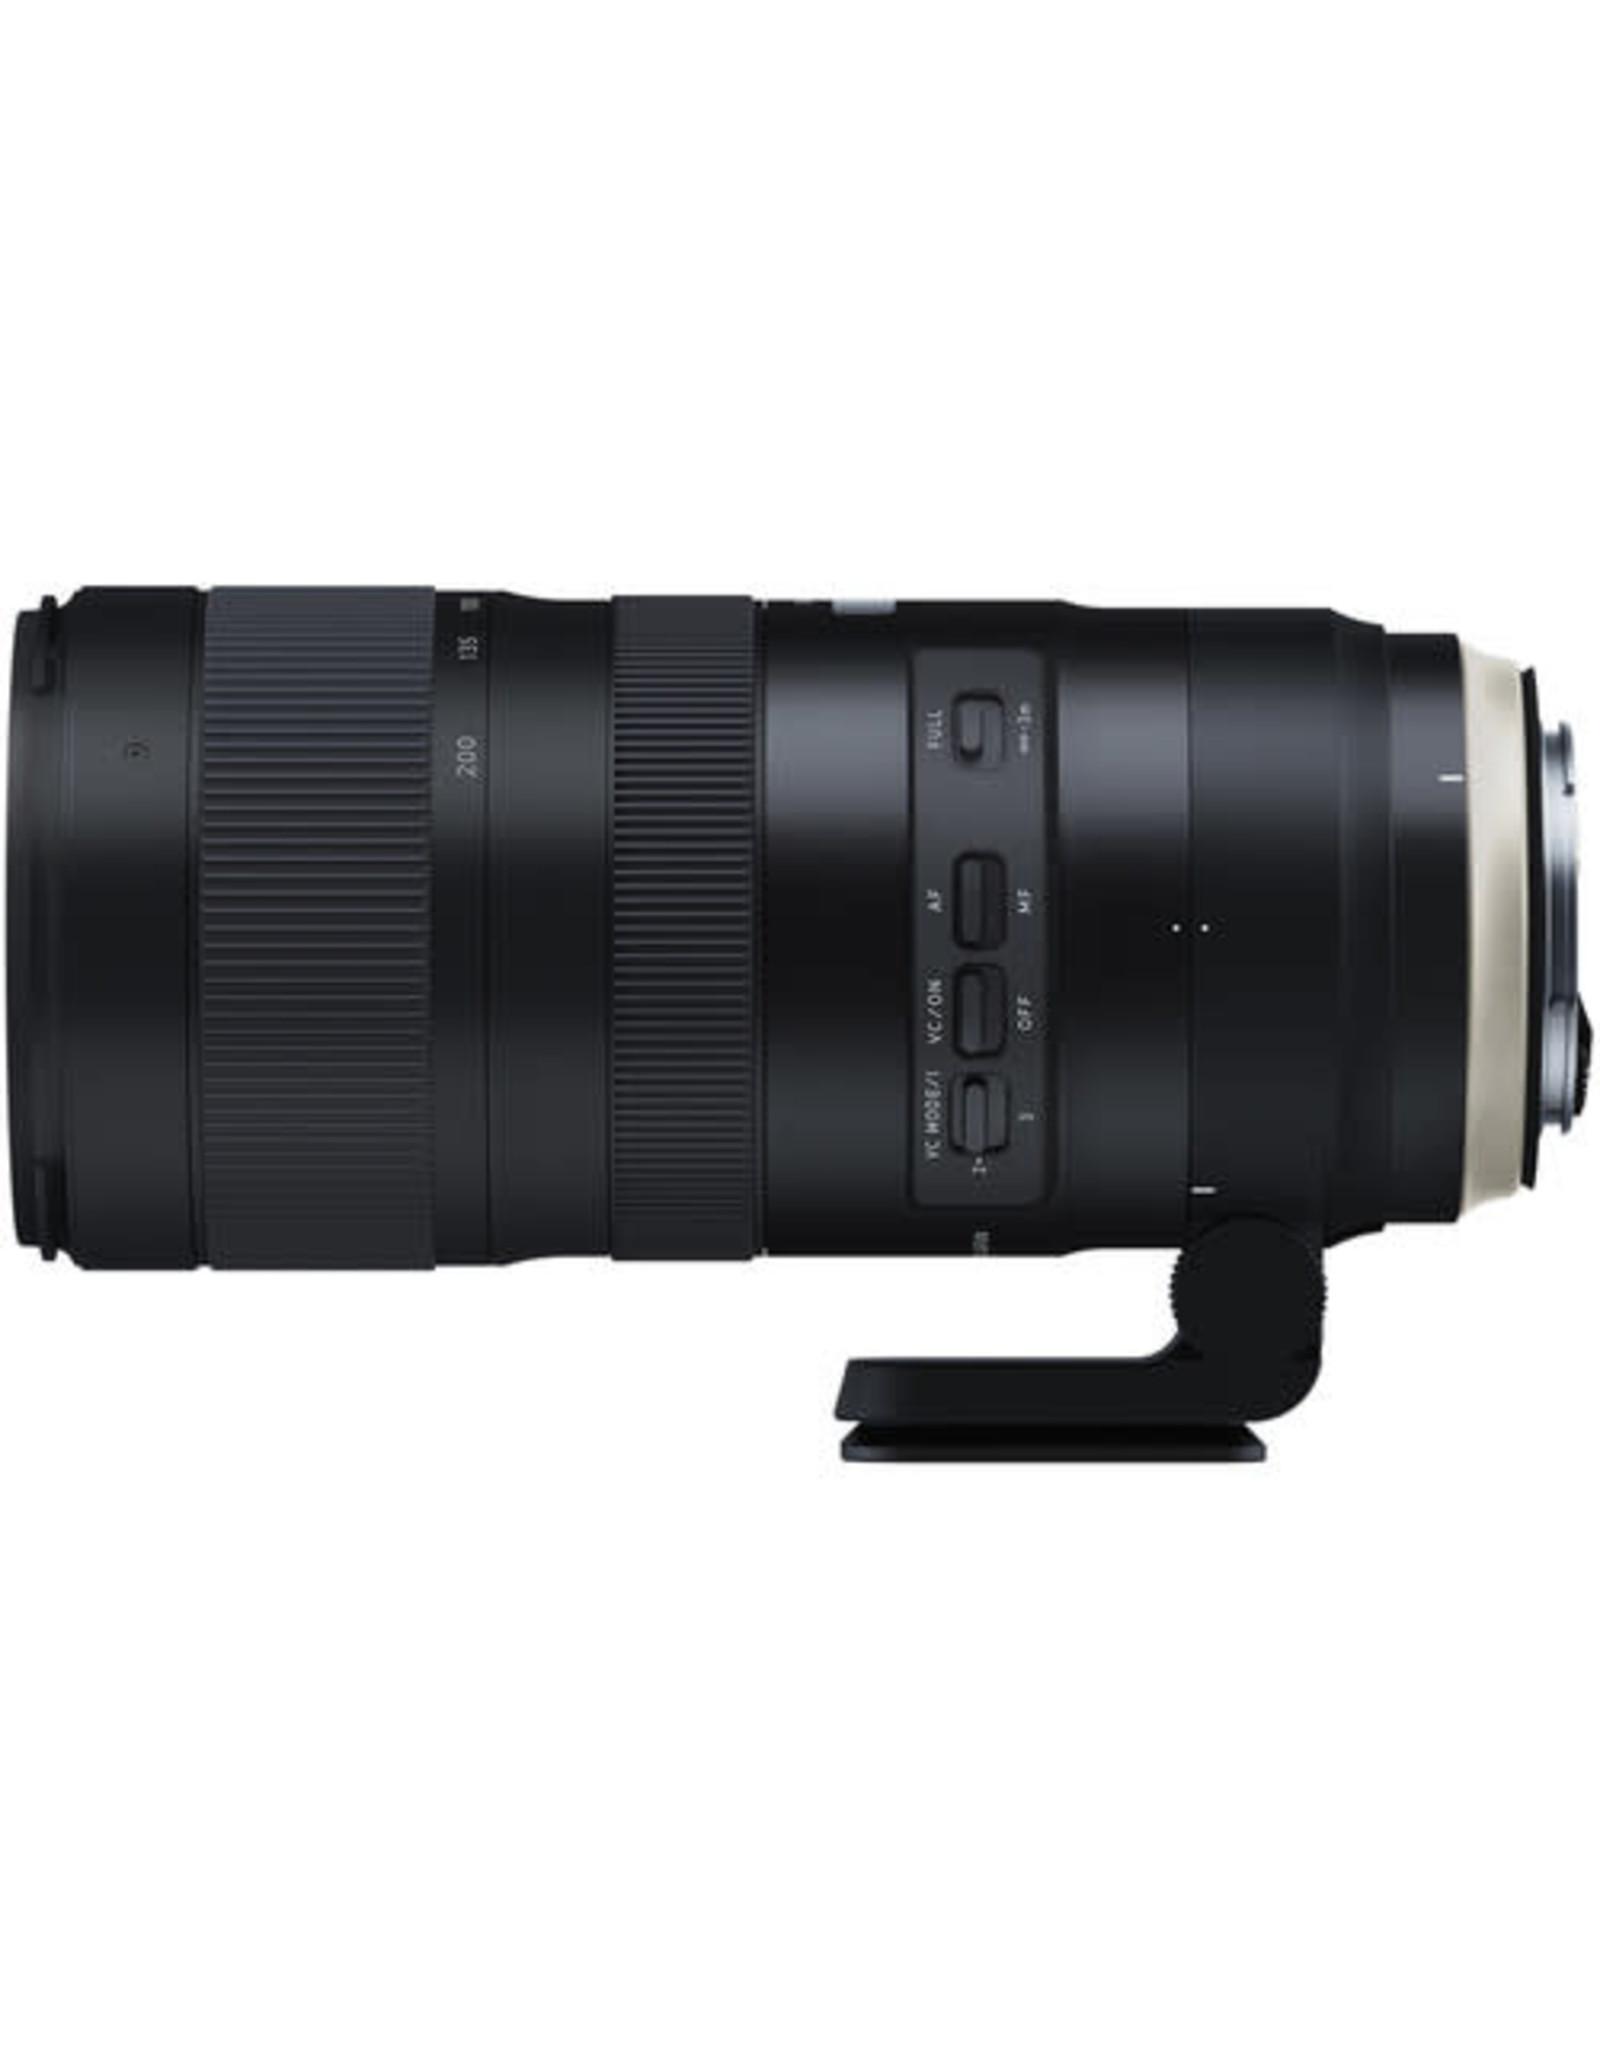 Tamron Tamron SP 70-200mm f2.8 Di VC USD G2  w/hood